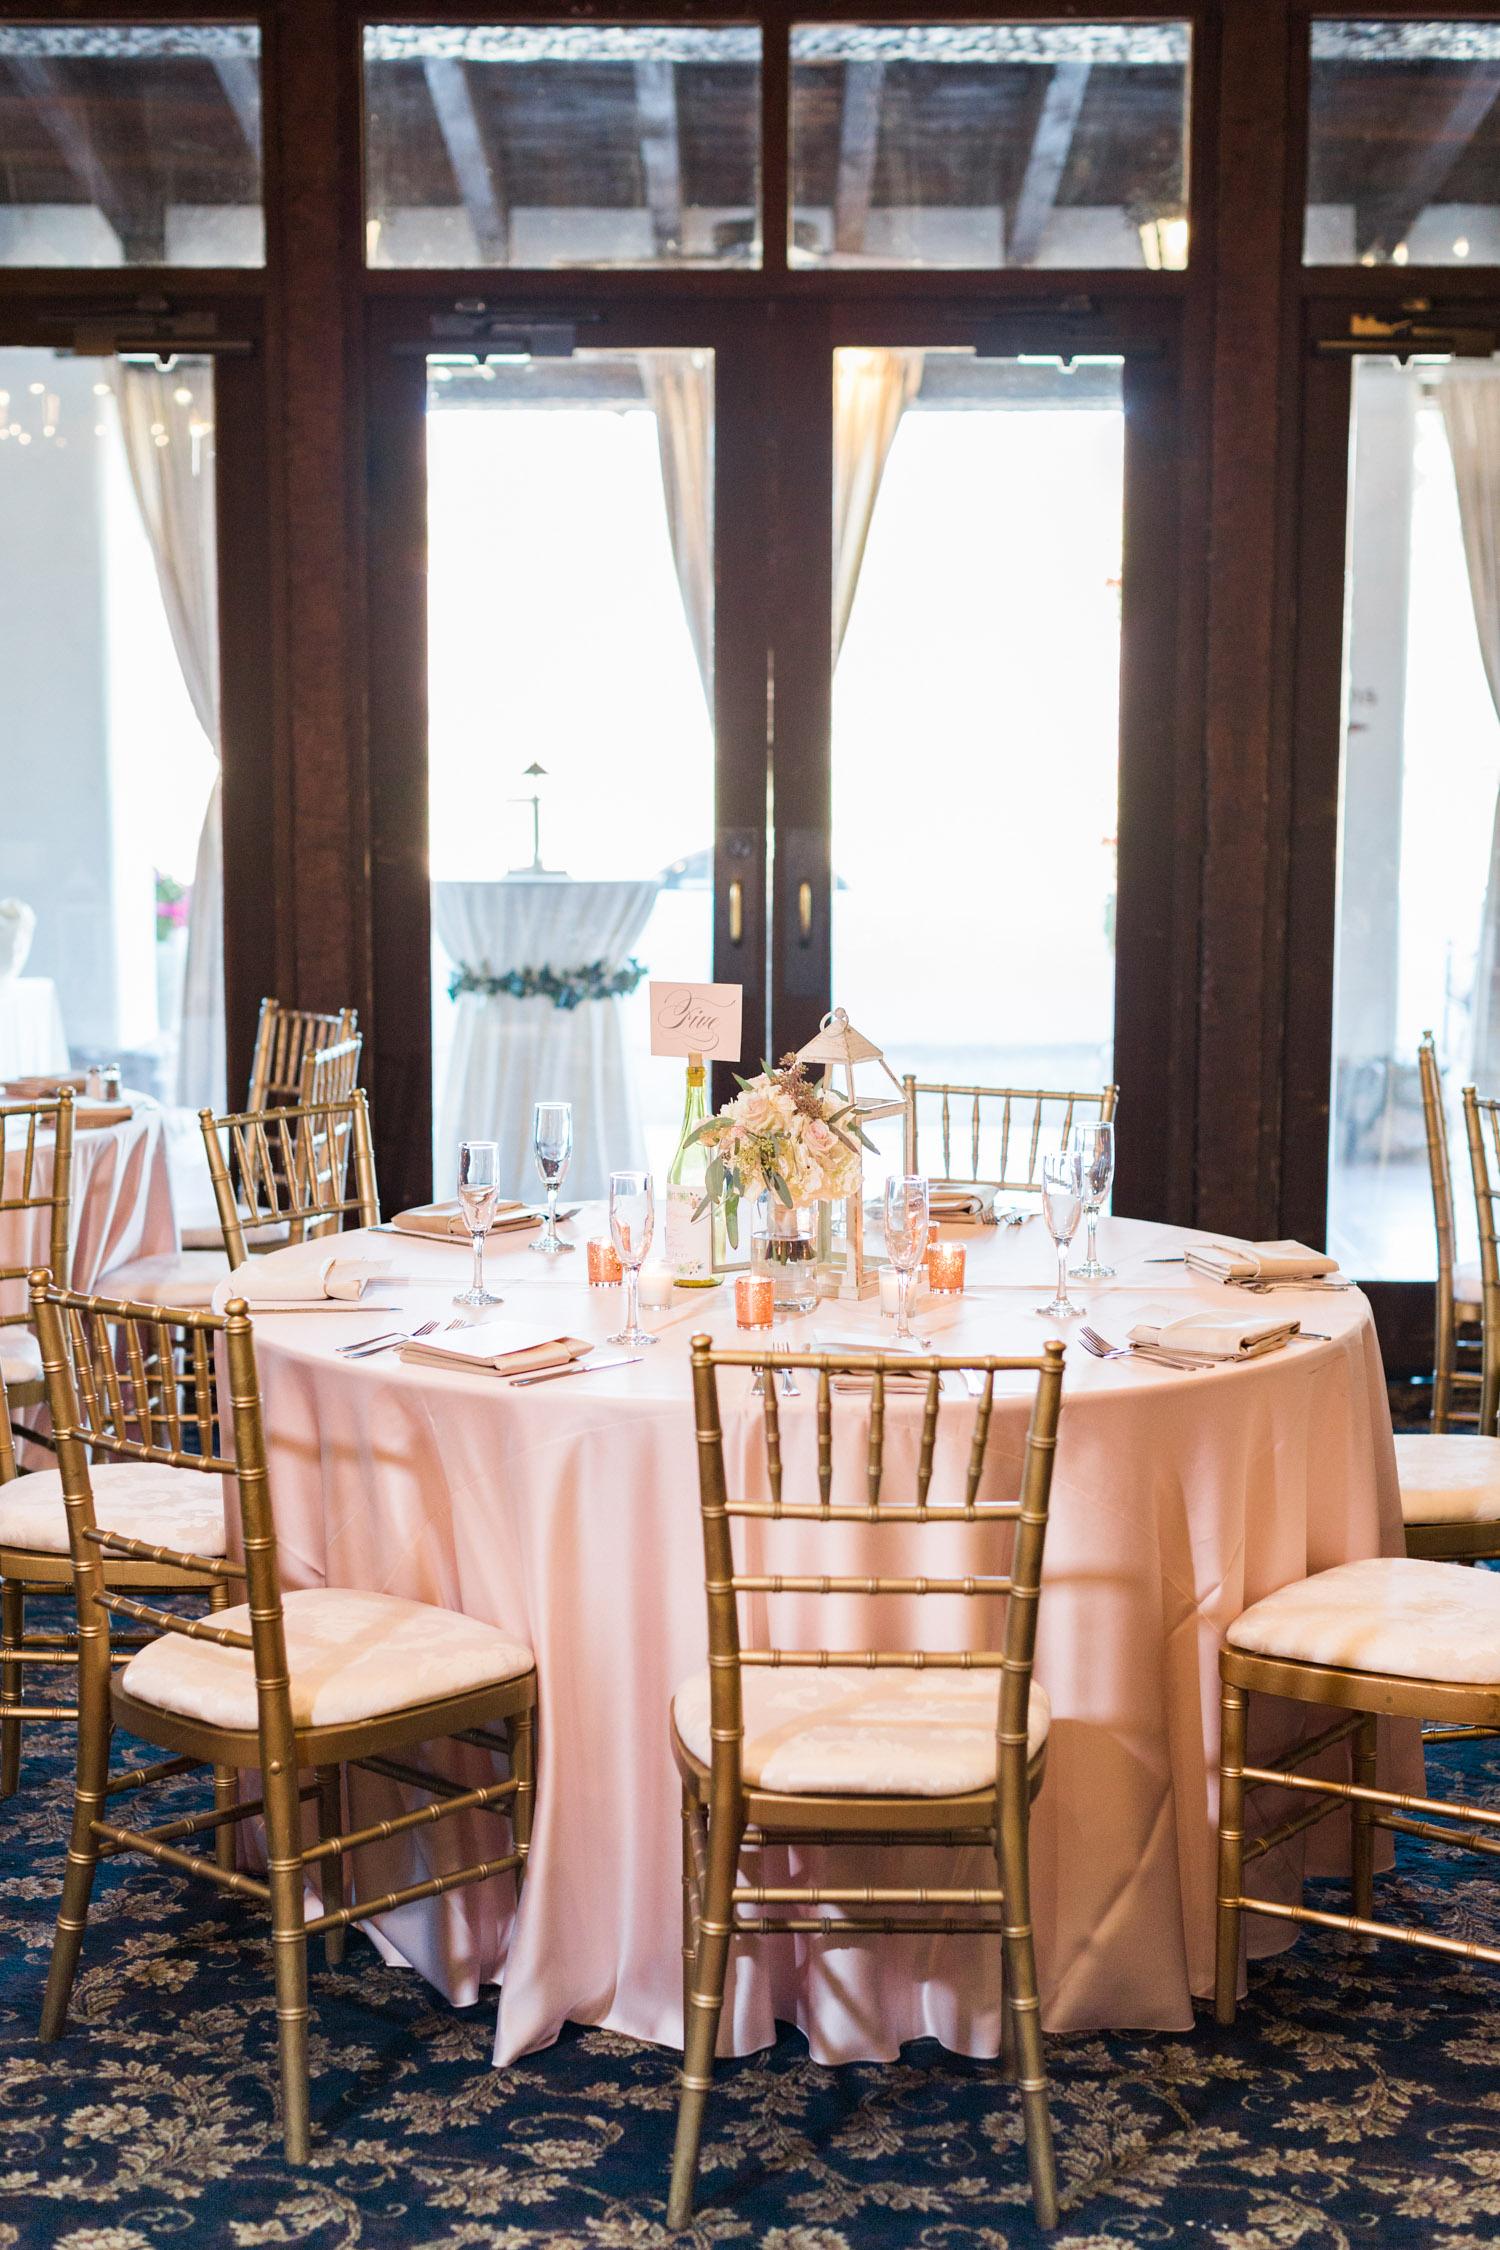 Ballroom set up with blush and gold chiavari chairs